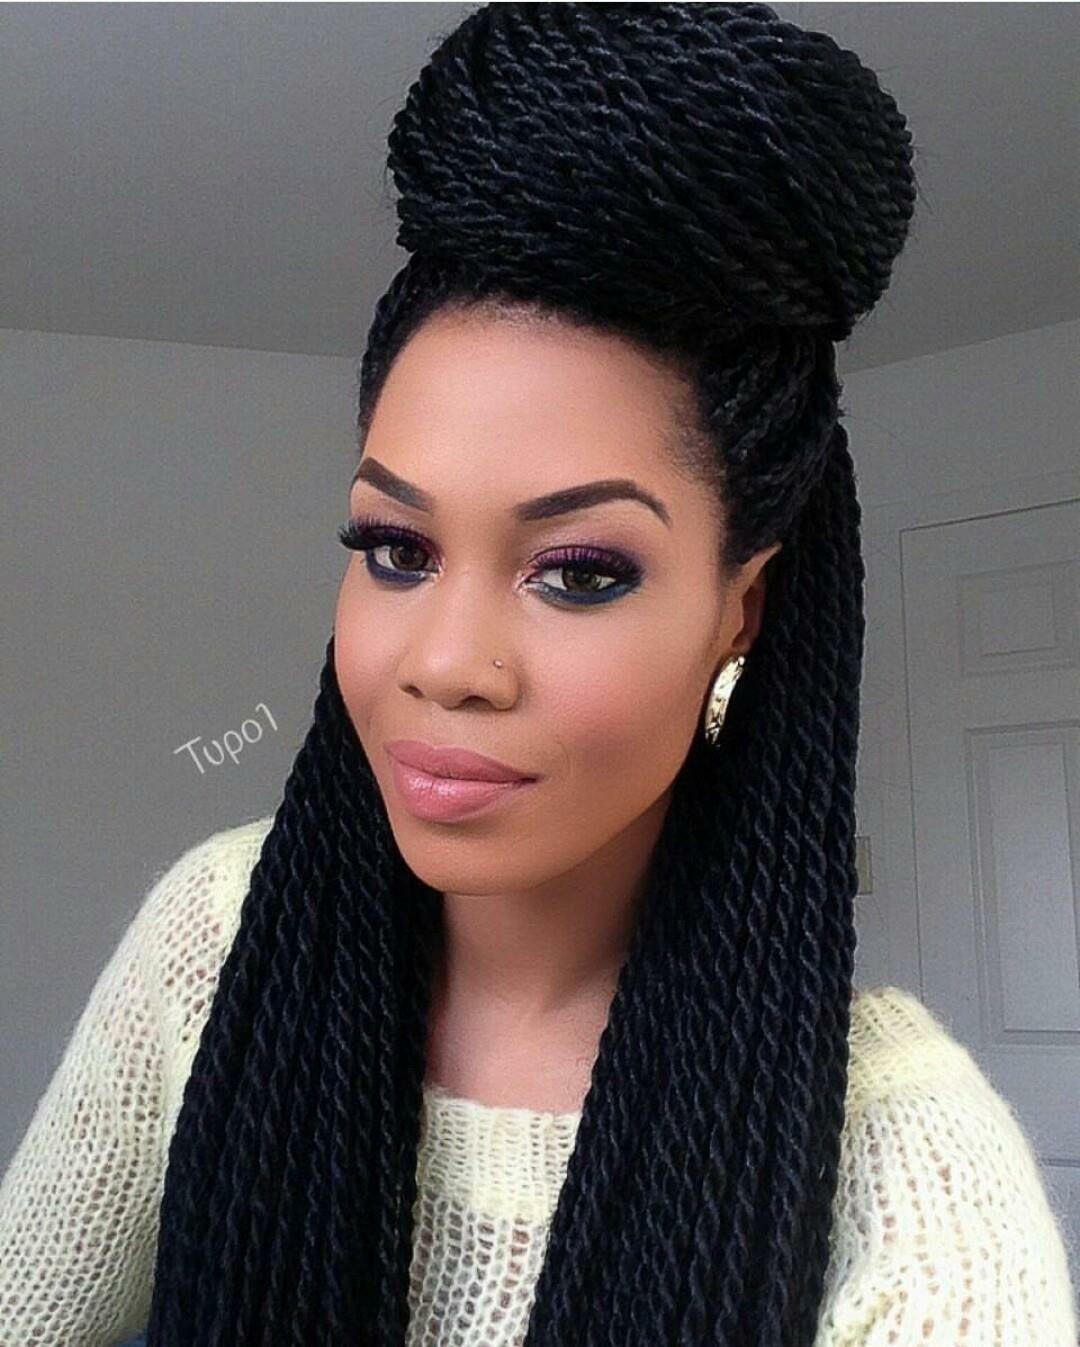 49 Senegalese Twist Hairstyles for Black Women | StayGlam |Medium Senegalese Twists Bun